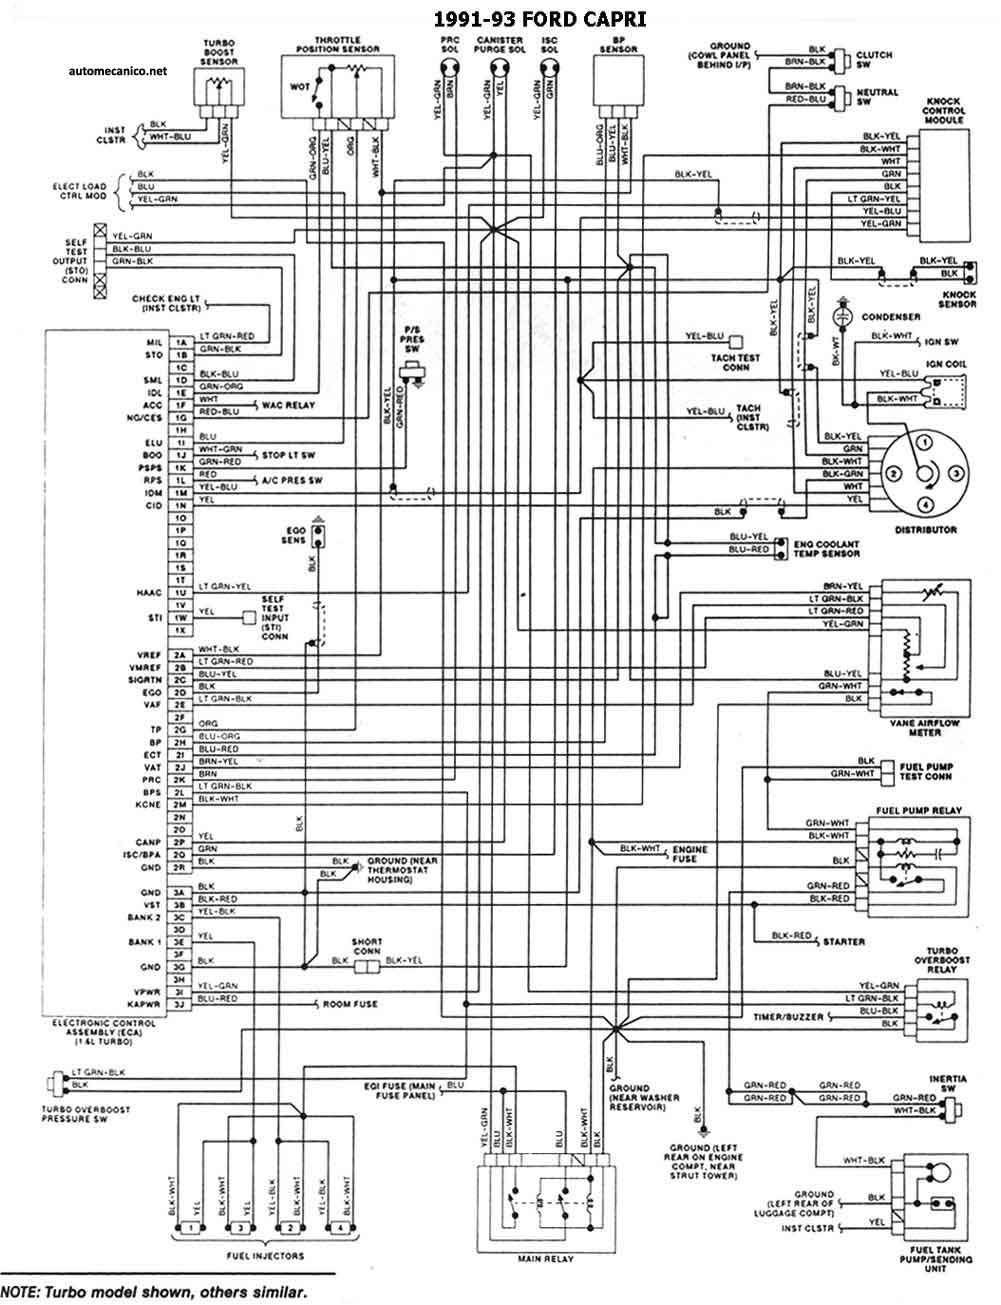 car manuals & literature 1983 ford mustang and mercury capri wiring  diagrams schematics sheets set oem guidohof  guidohof